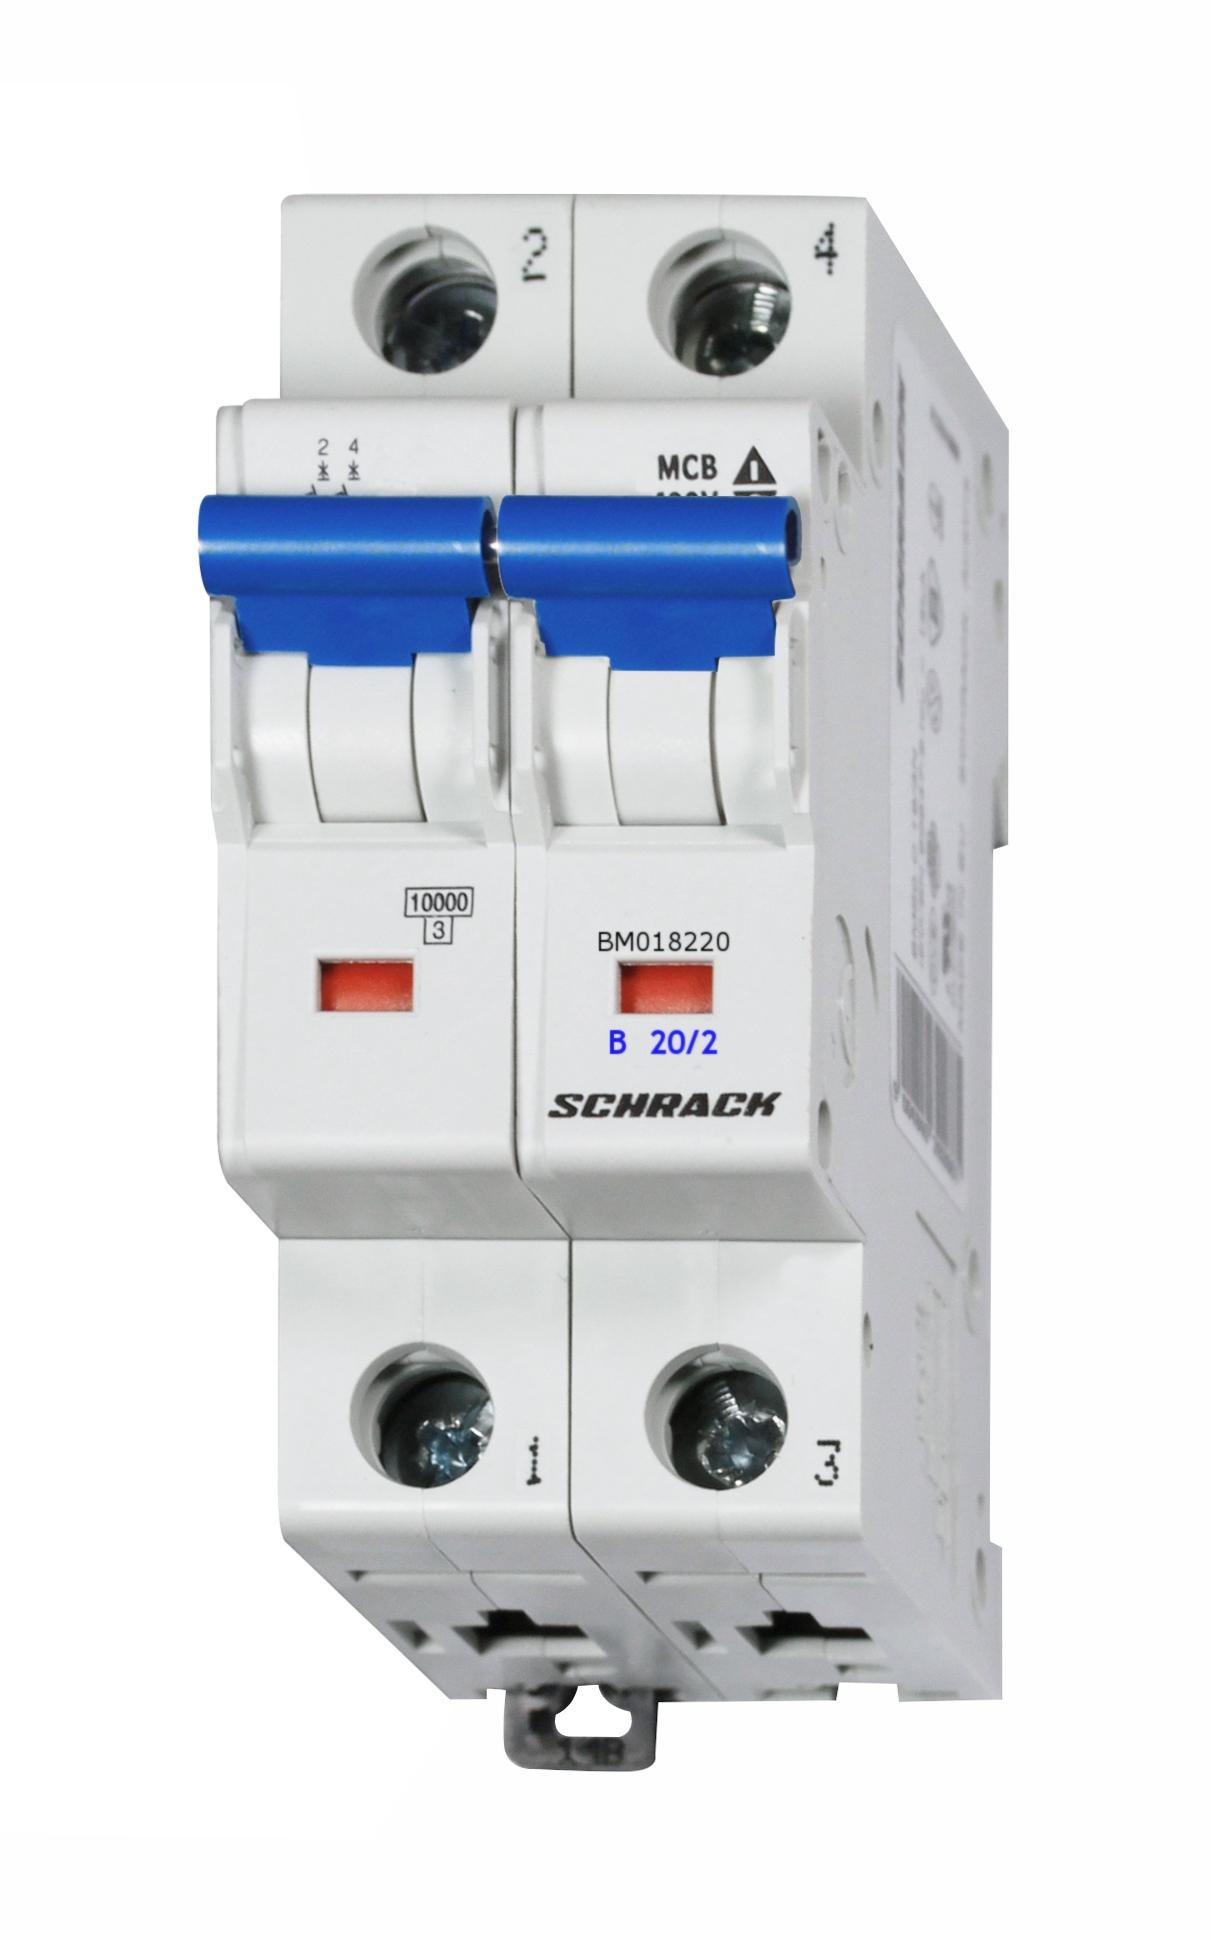 BM018220 - Schrack Technik